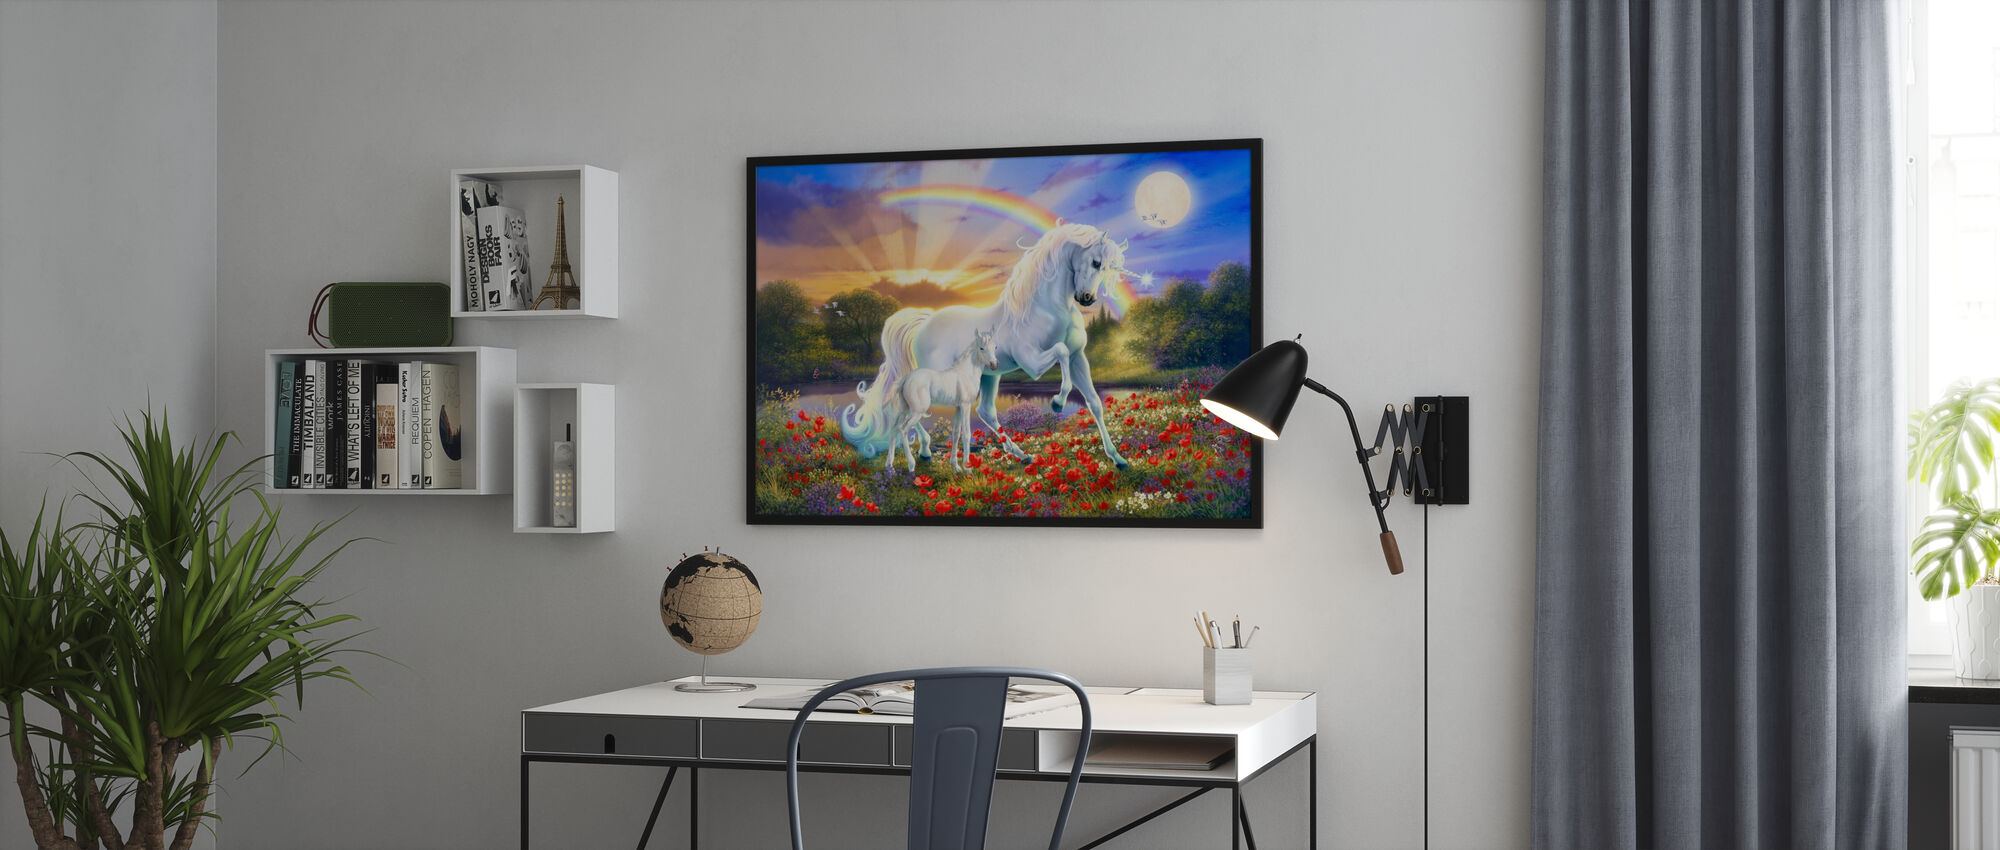 Regnbåge enhörning - Inramad tavla - Kontor